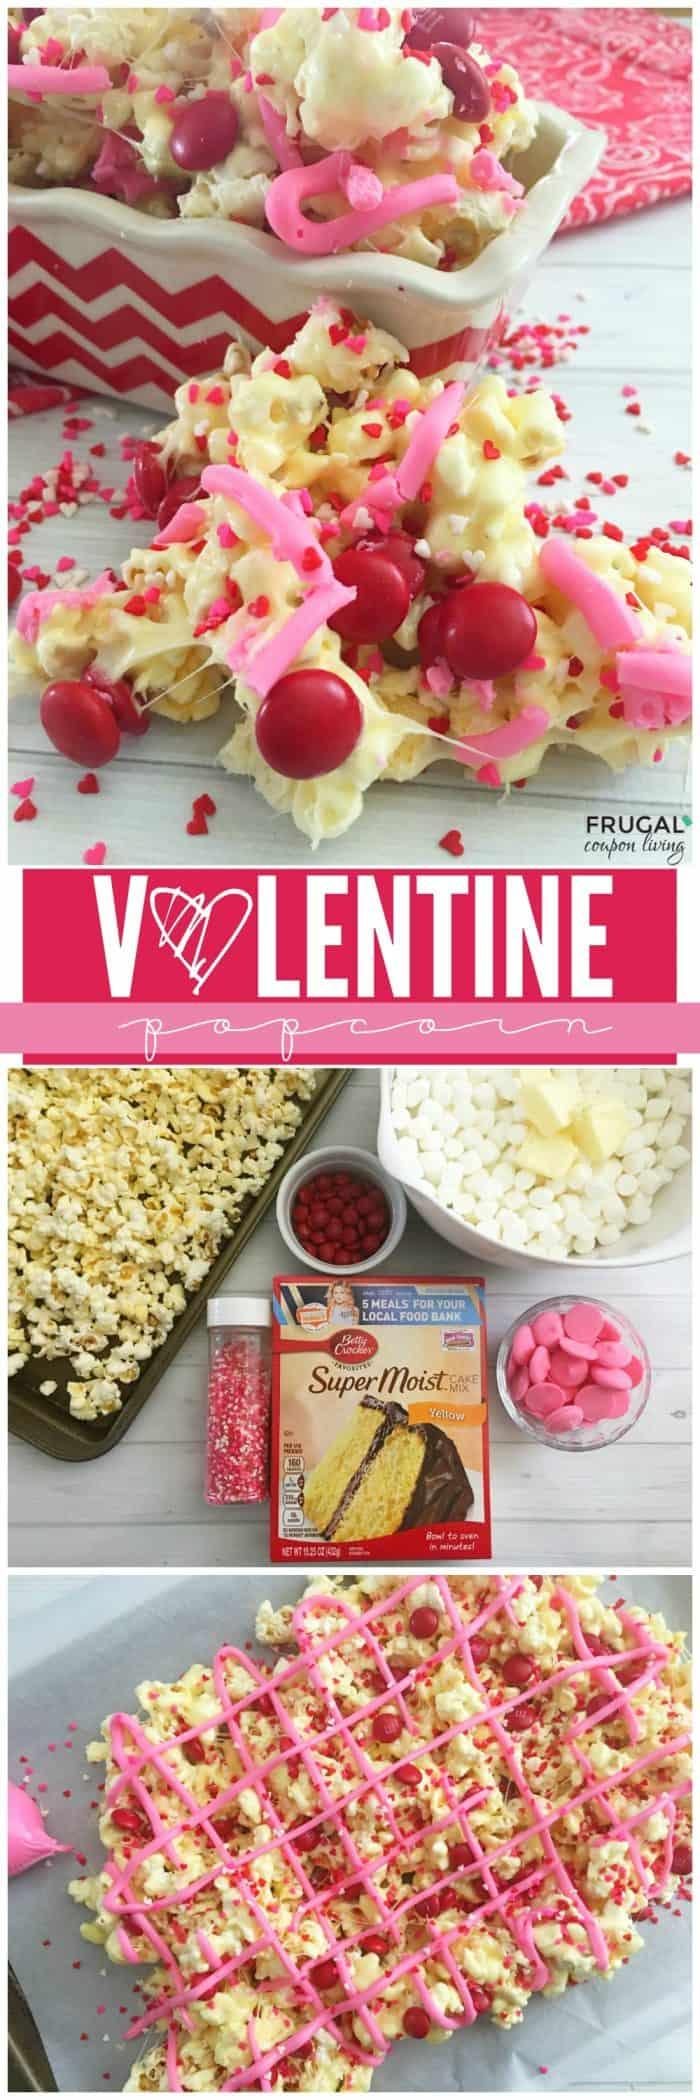 valentine-popcorn-frugal-coupon-living-long